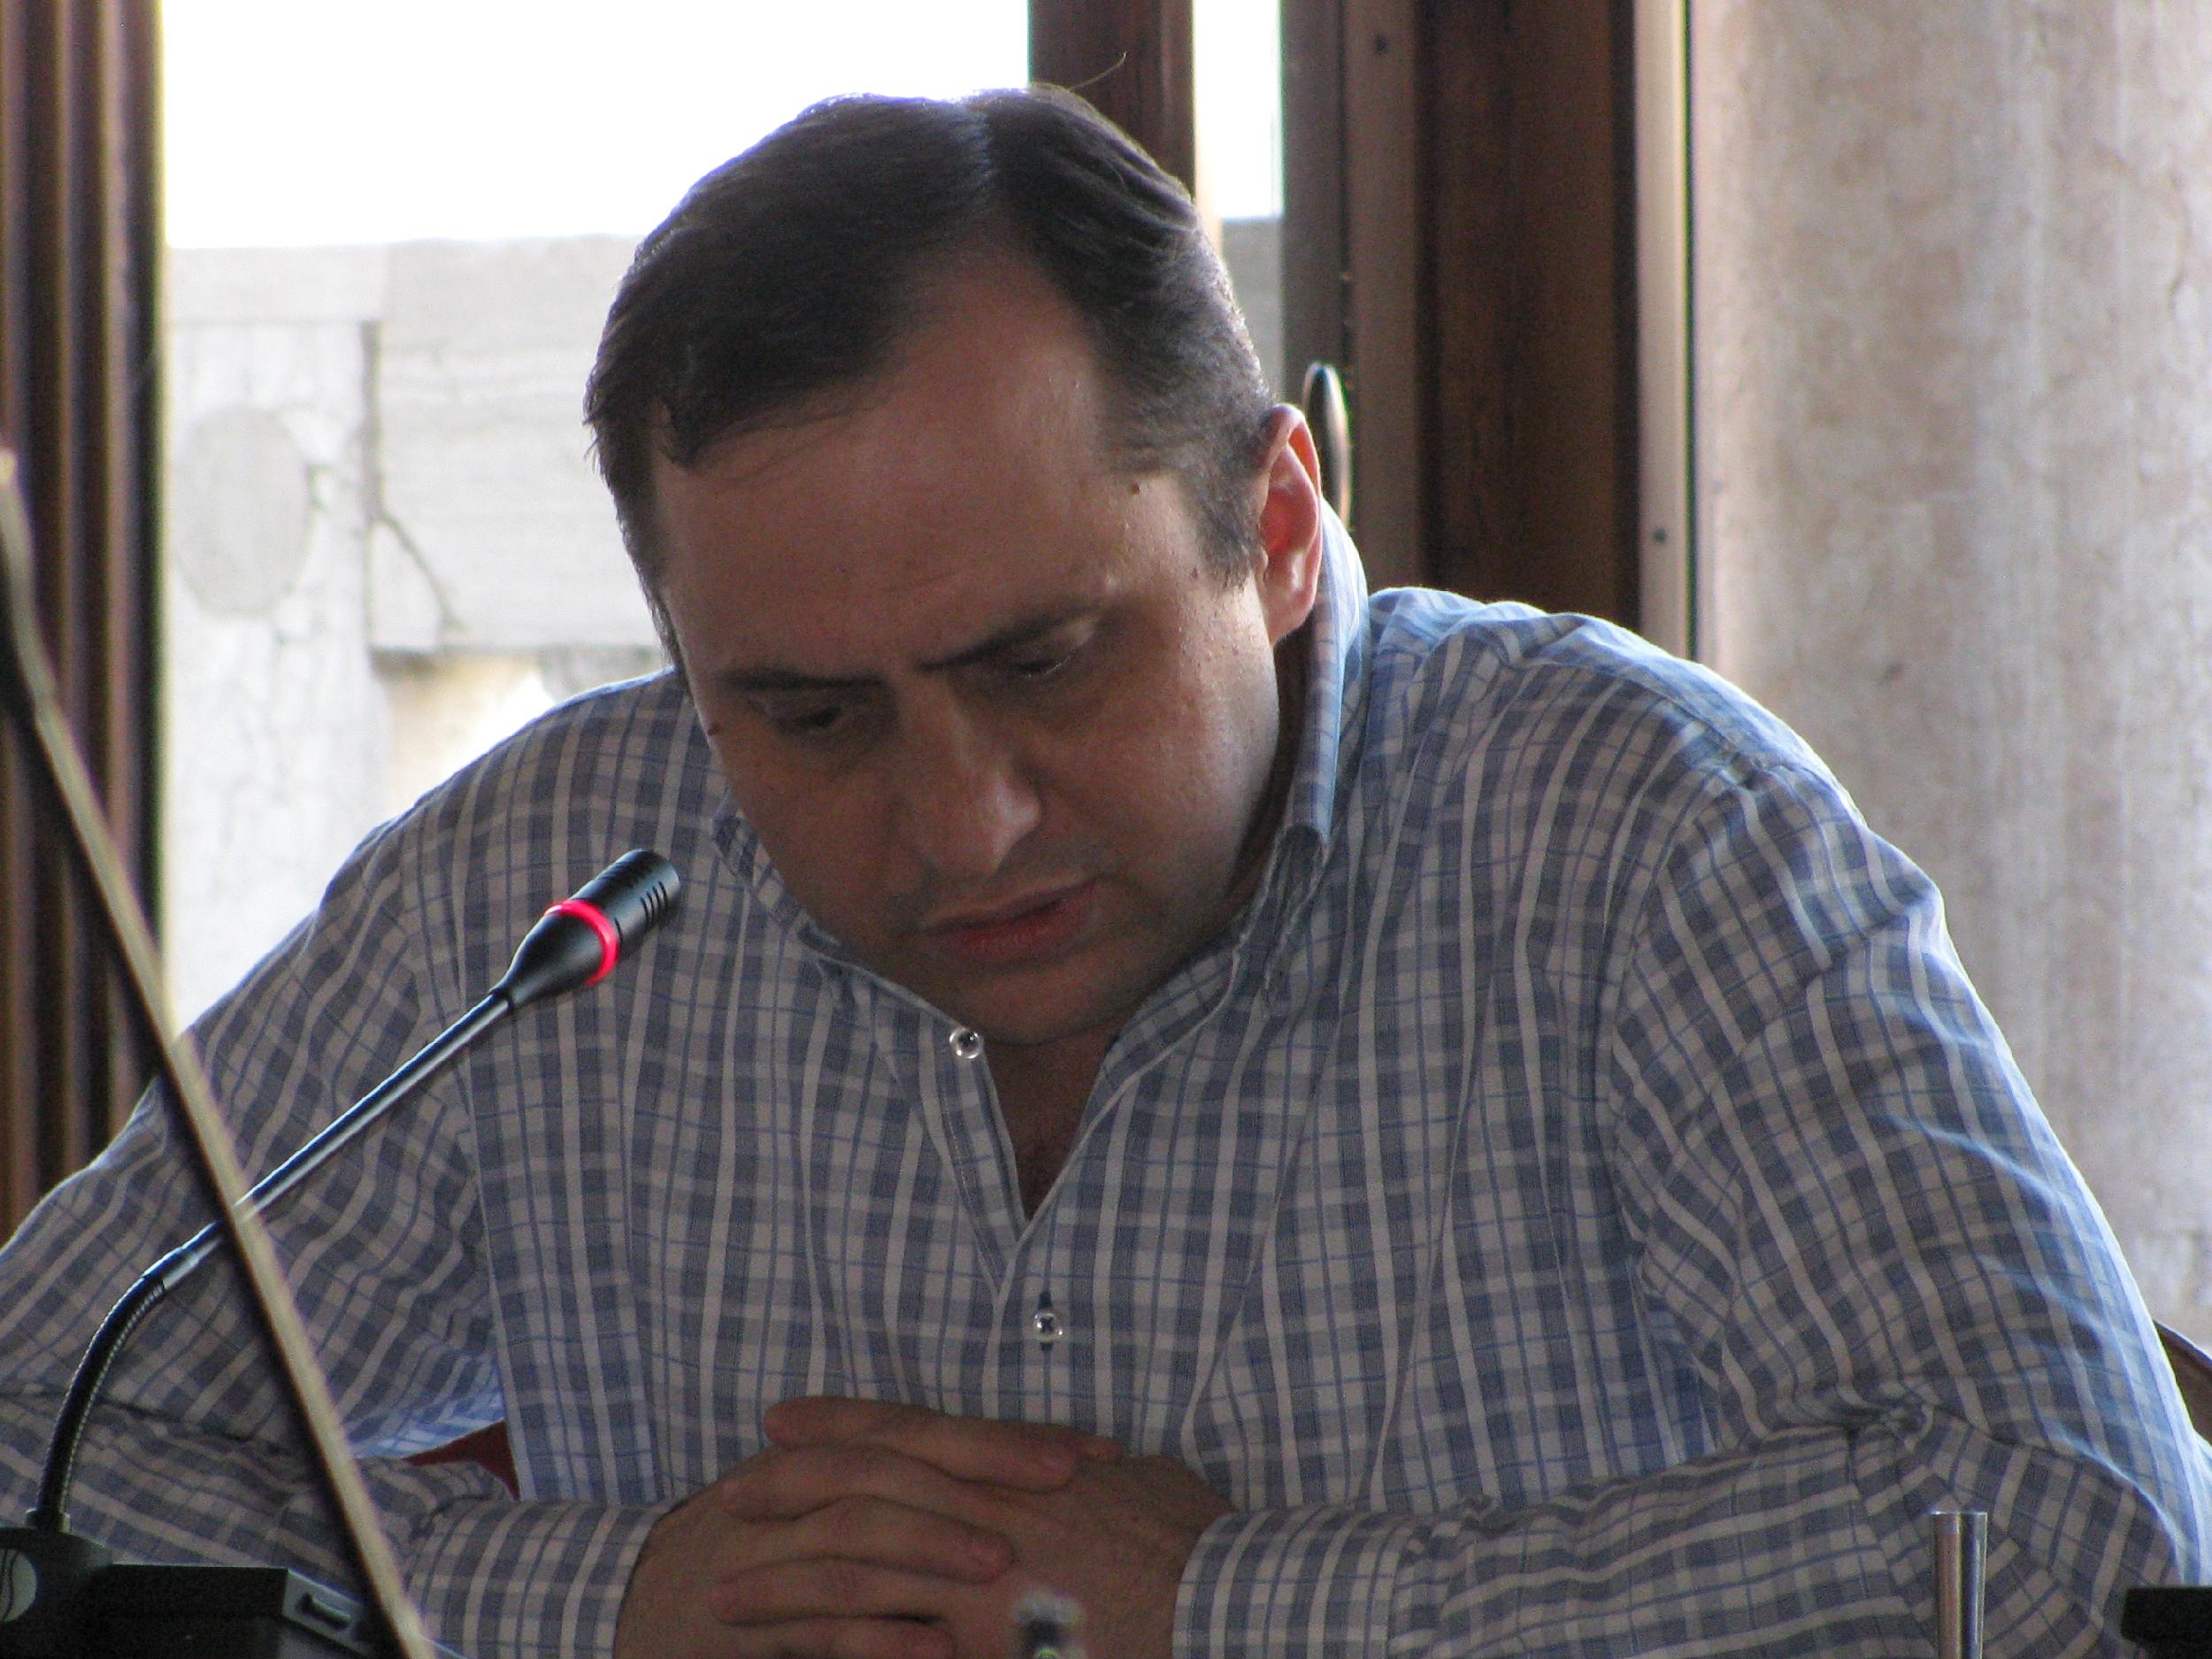 Dr. Daniel Cain